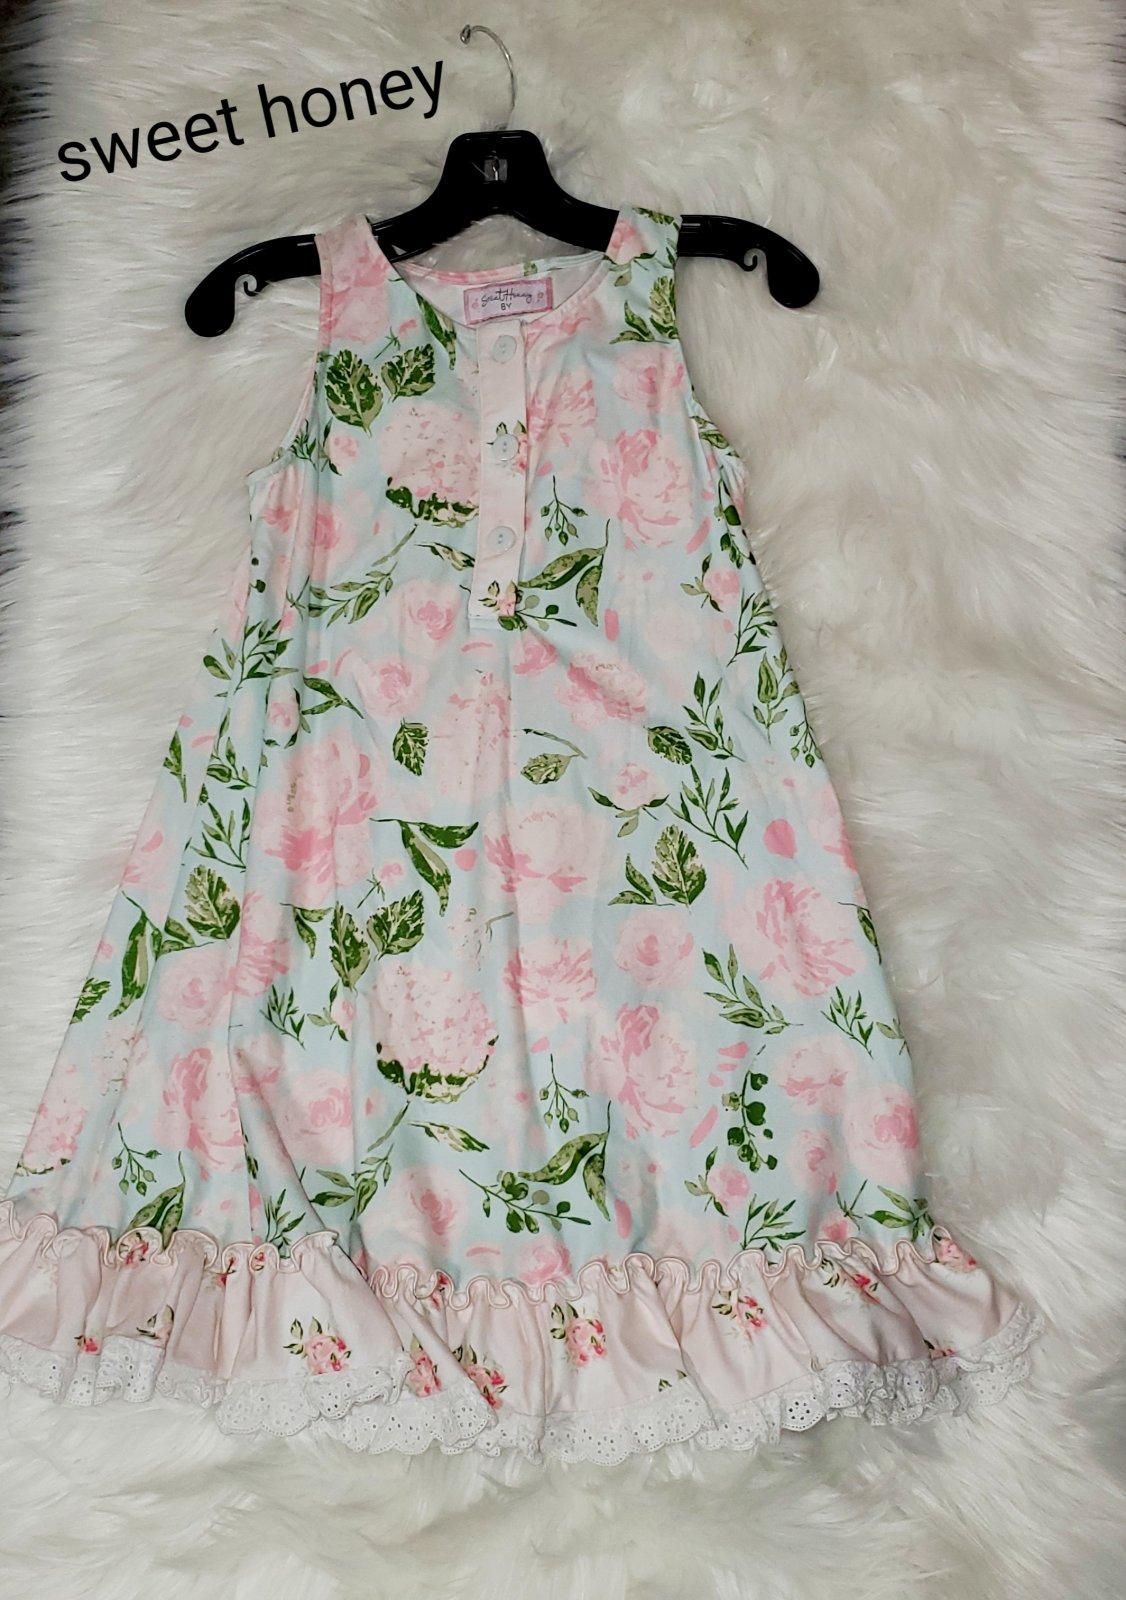 Sweet honey dress floral girls size 8